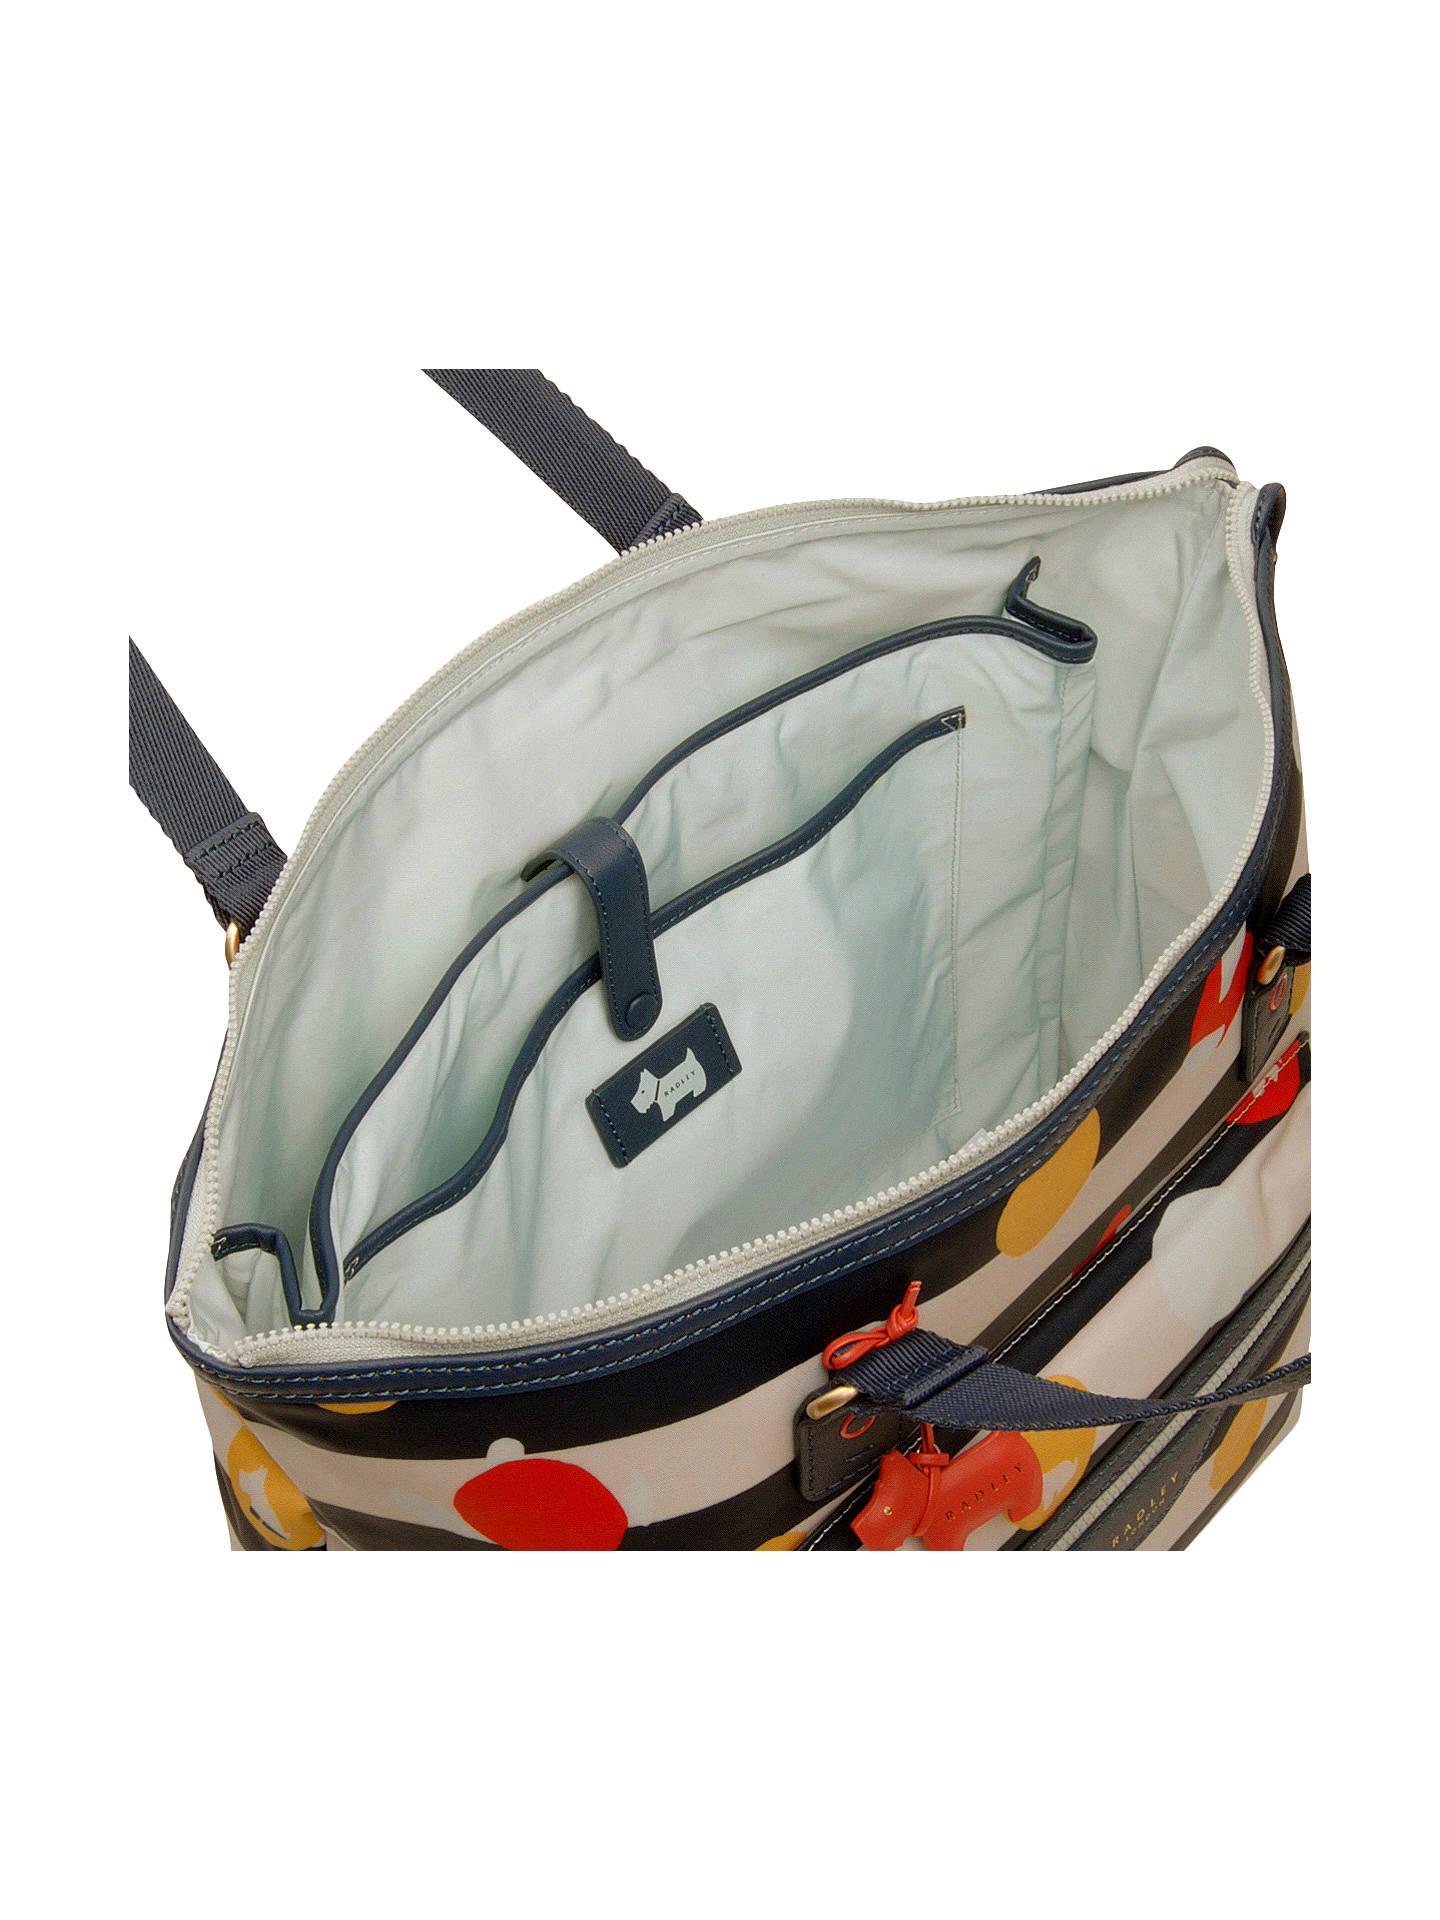 e70898eeb15 ... BuyRadley On The Dot Large Ziptop Shoulder Bag, Petrol Online at  johnlewis.com ...